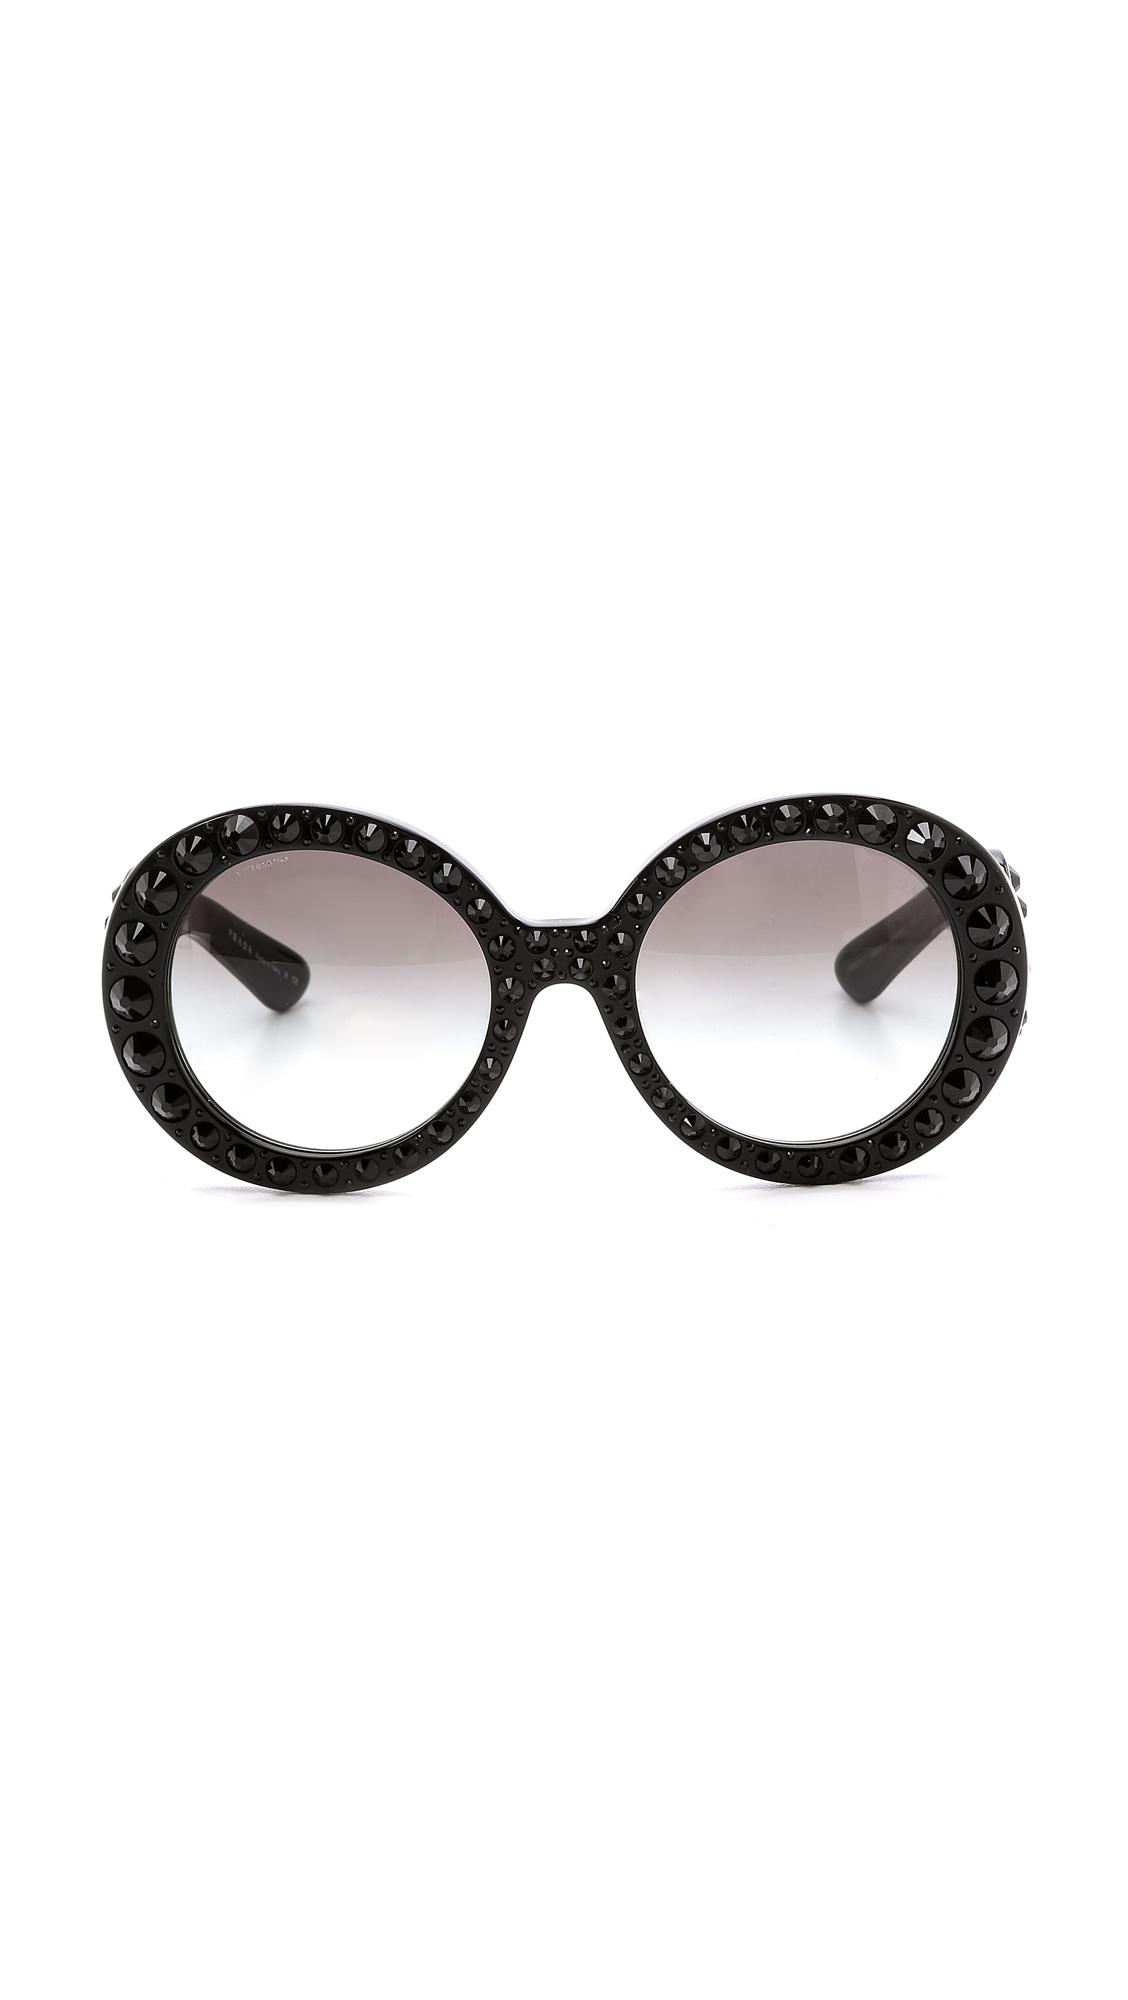 75b150f29e0 ... ireland lyst prada studded round sunglasses black black in black 3b820  b5dd7 greece dual studded cats eye ...